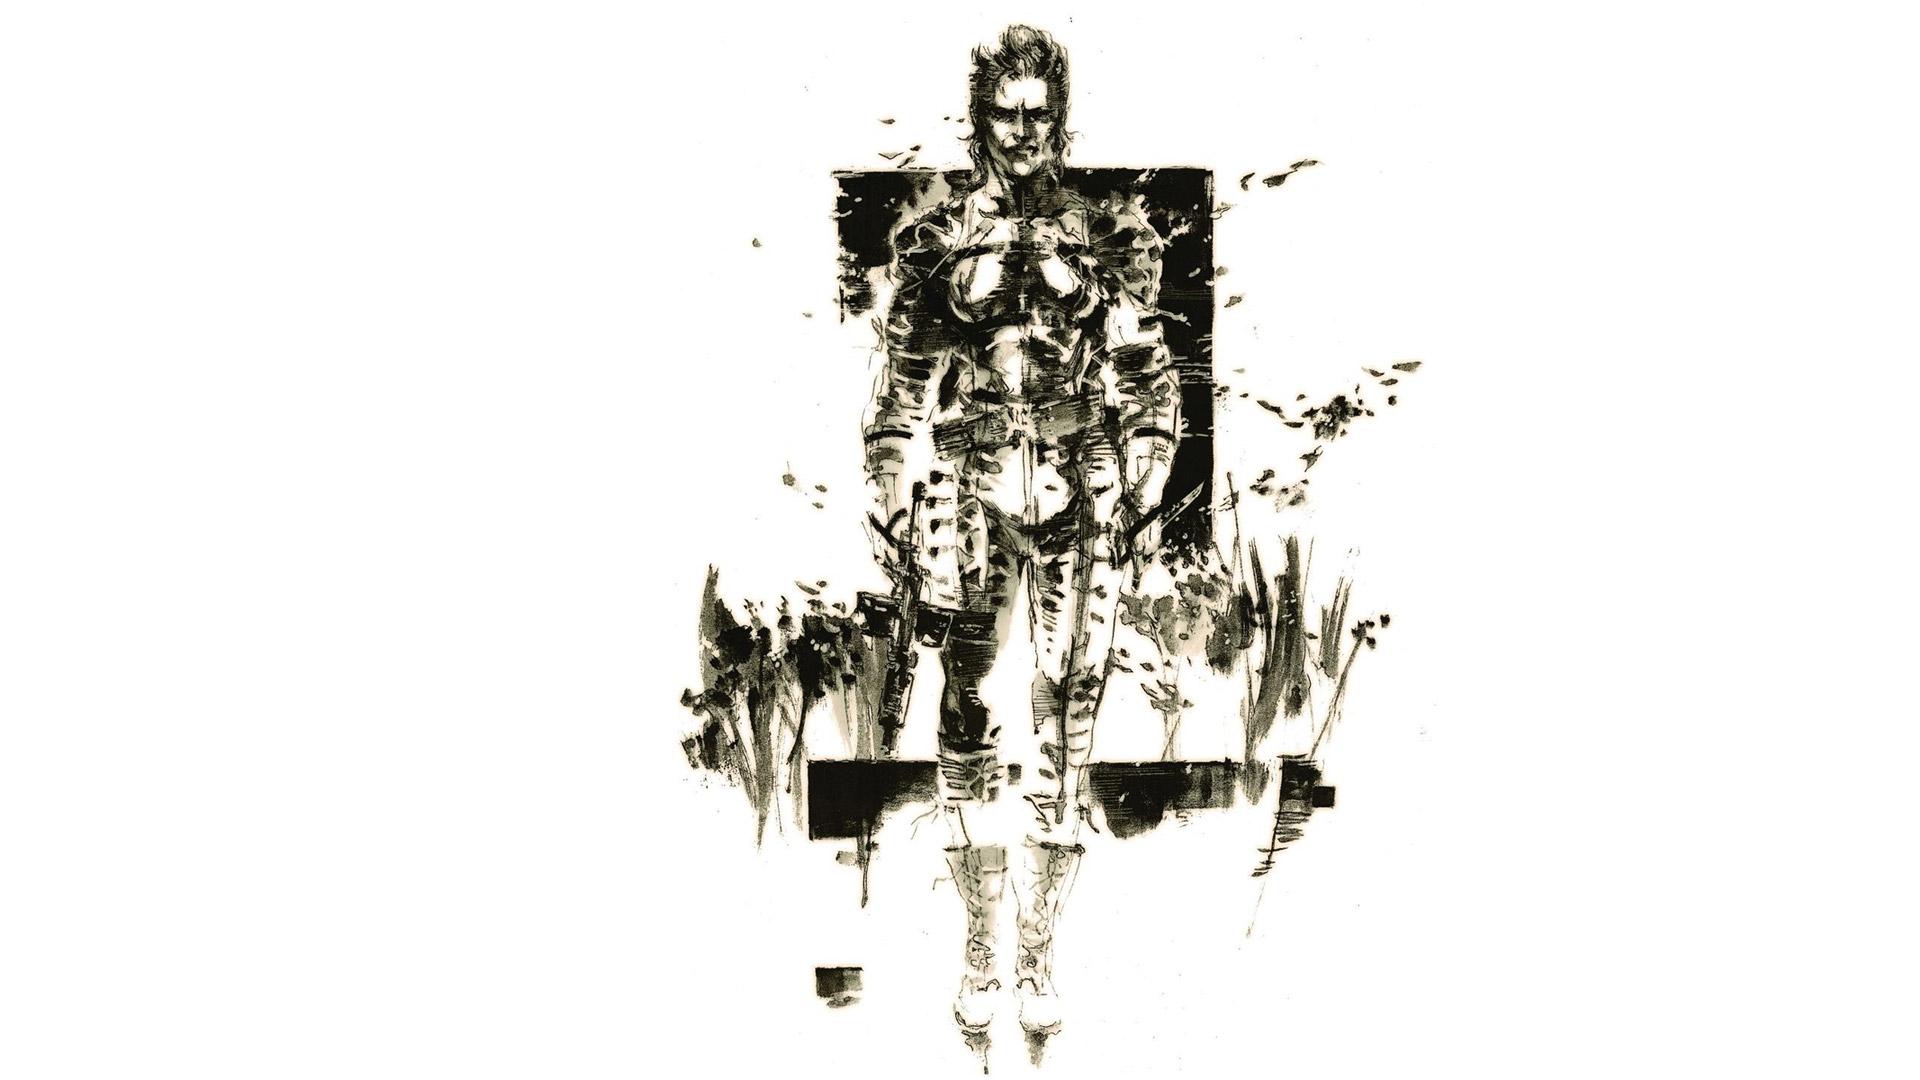 Free Metal Gear Solid 3 Wallpaper in 1920x1080